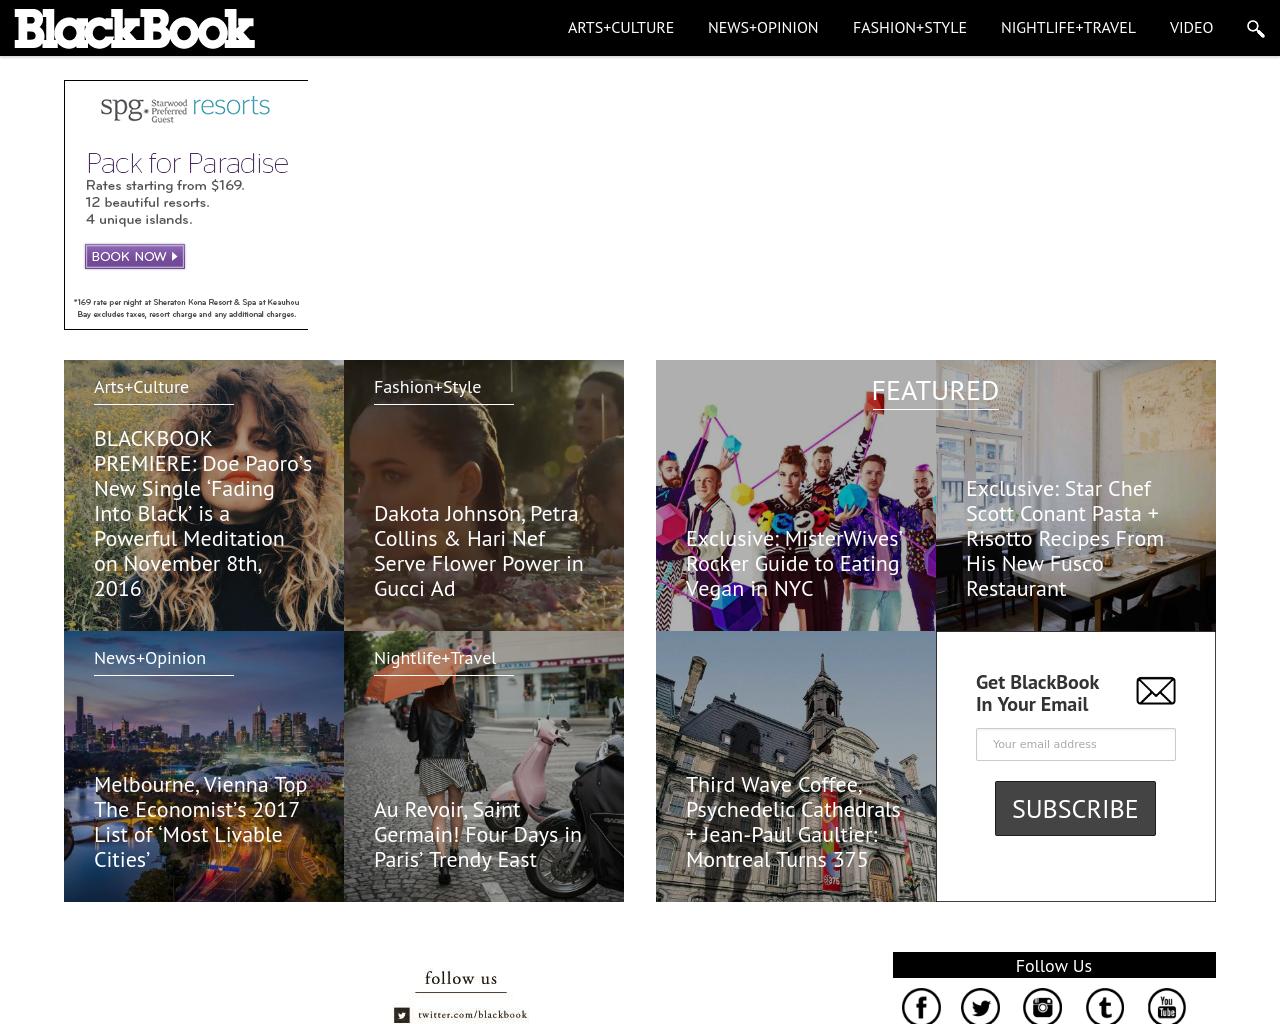 BlackBook-Media-Advertising-Reviews-Pricing